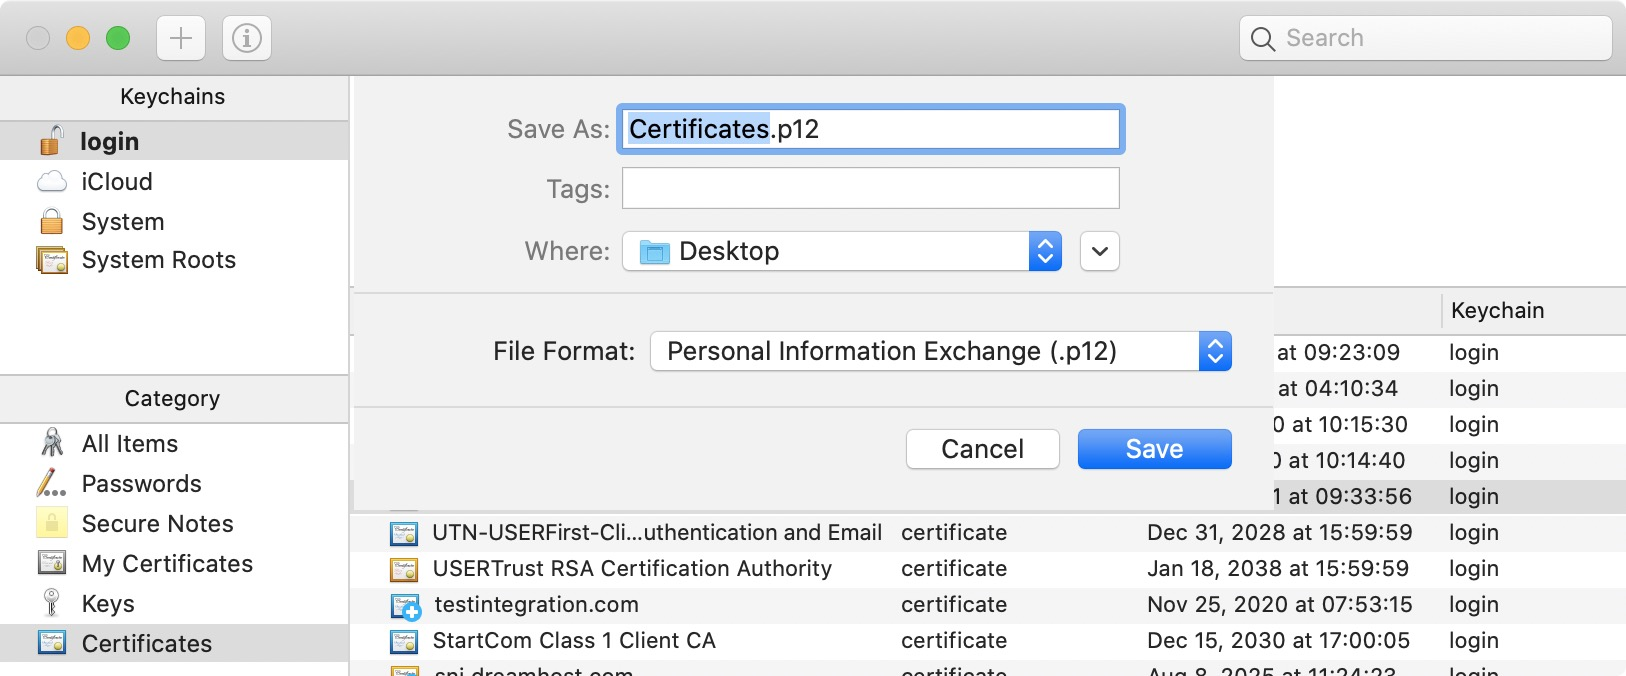 save certificate.p12 file